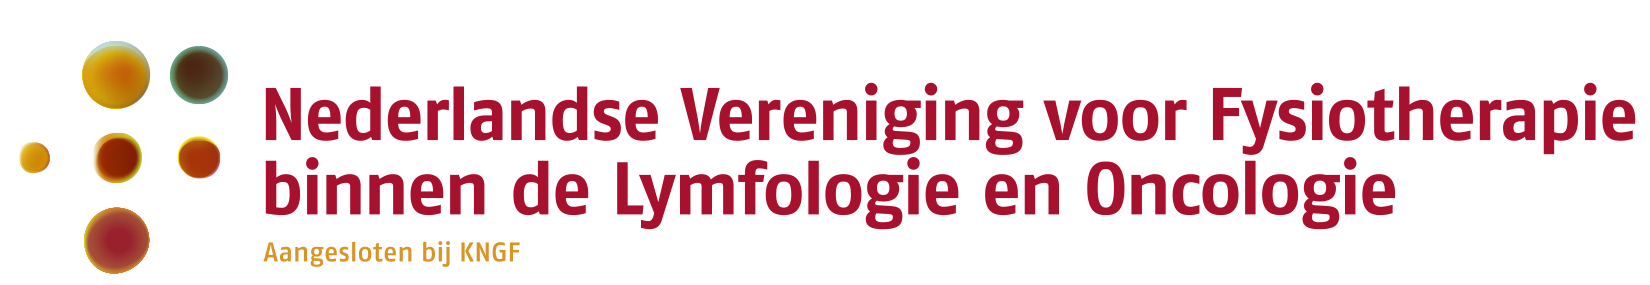 kngf_merk_nvfl_lang-tiff-bestand